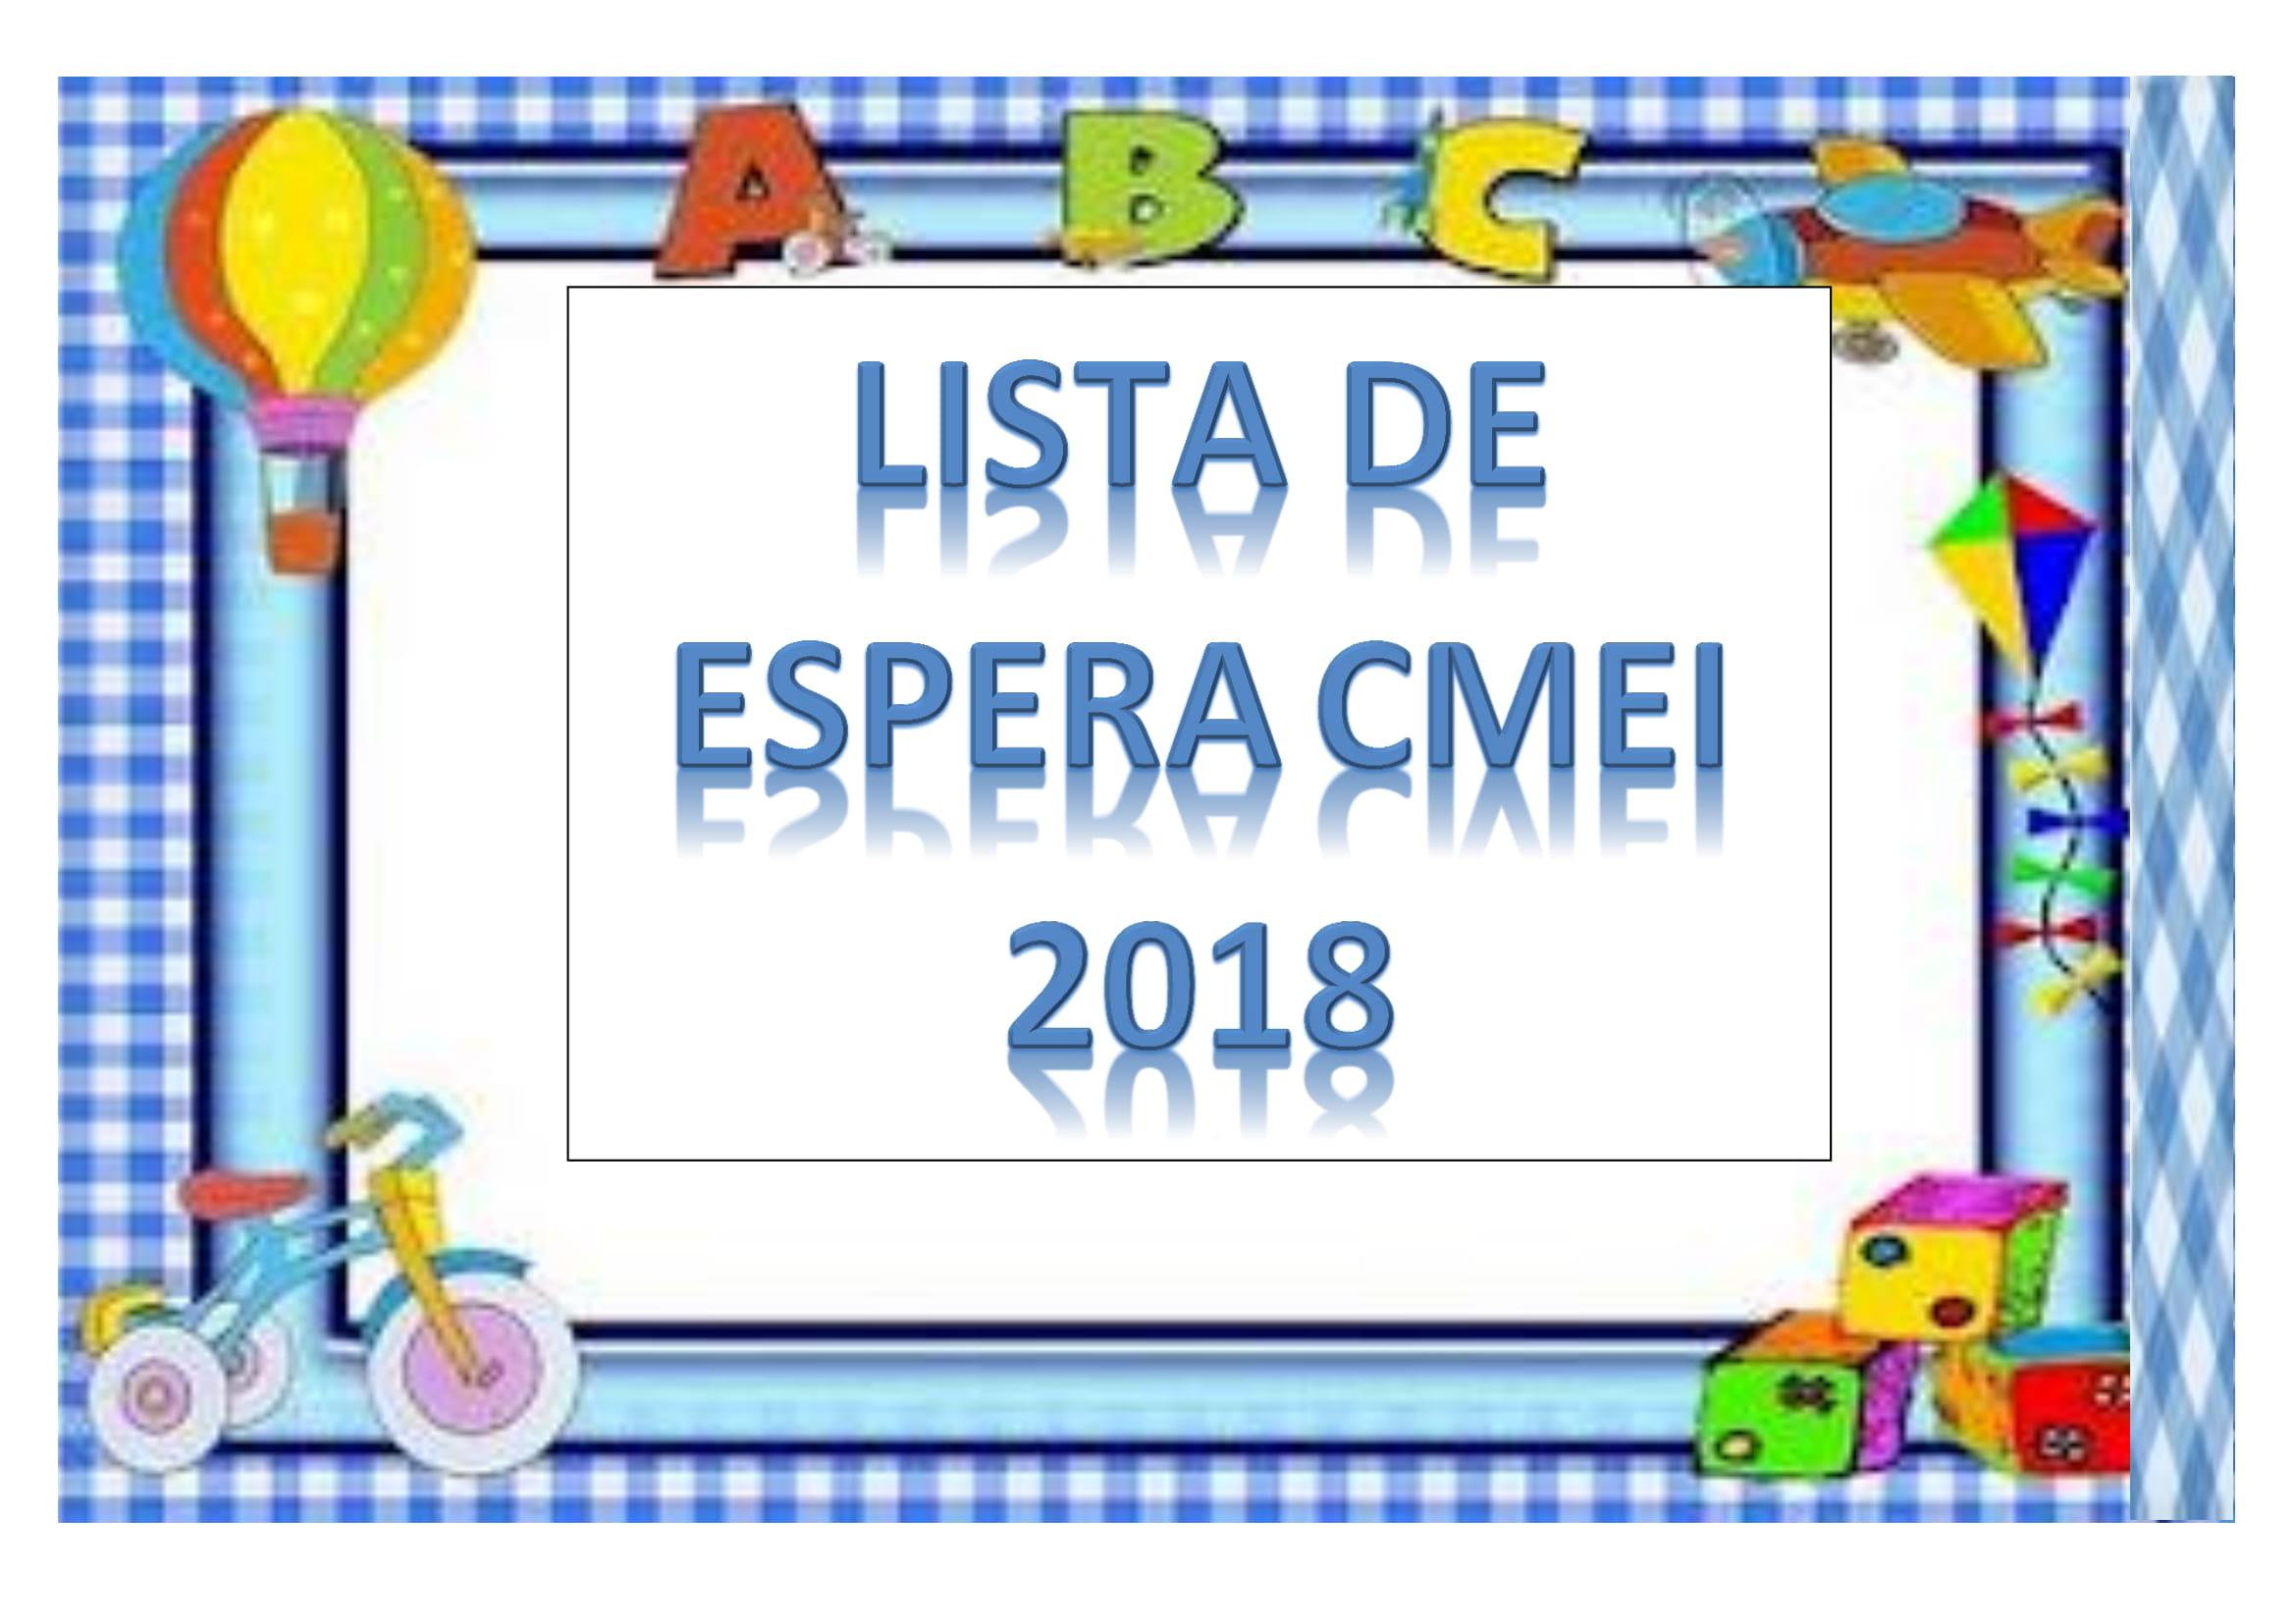 LISTA DE ESPERA  CMEI 2018